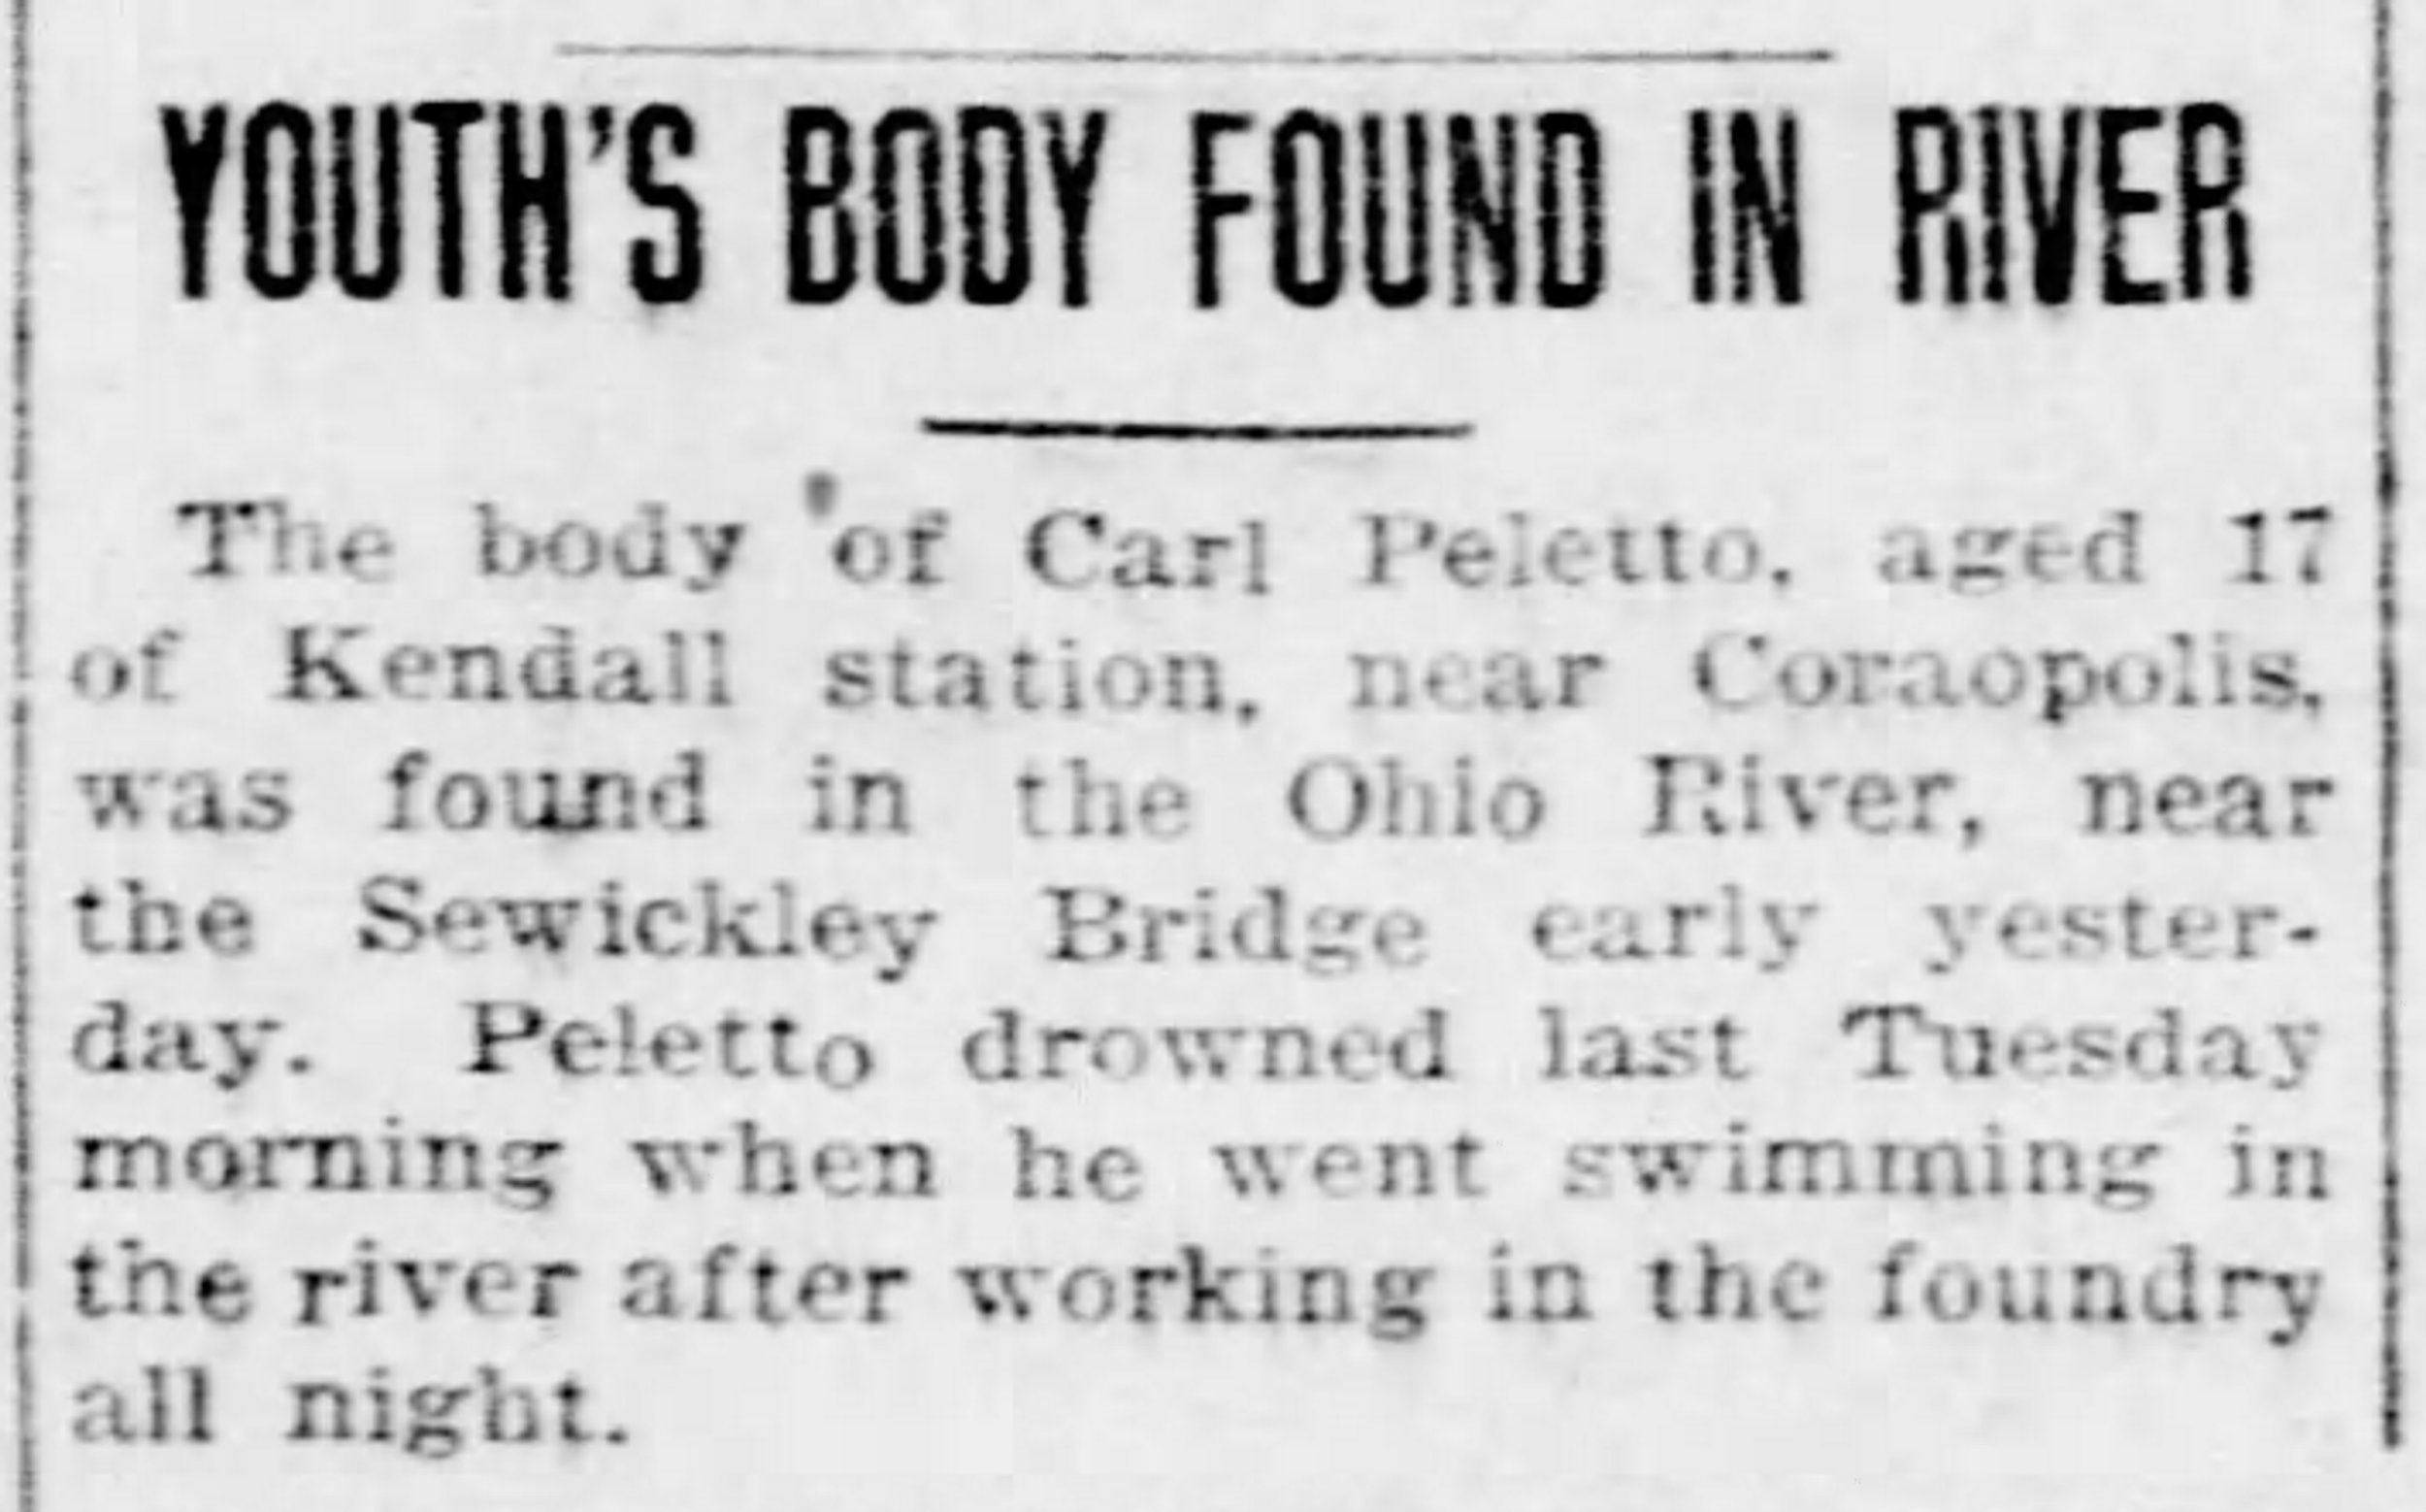 Pittsburgh Post Gazette, August 16, 1924